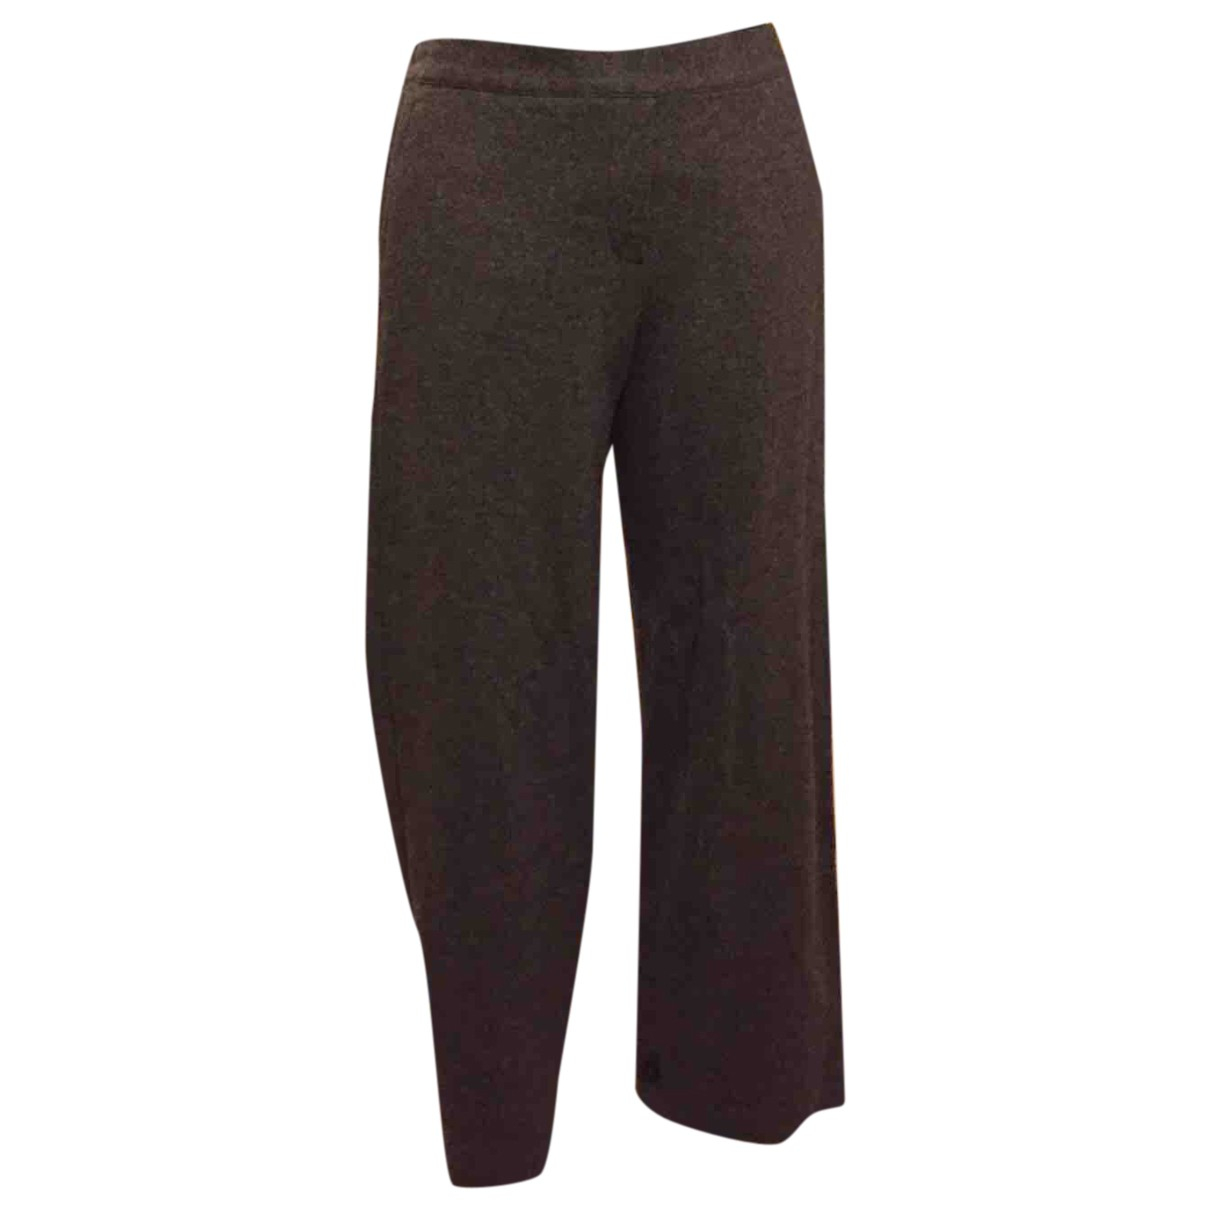 Theory \N Grey Wool Trousers for Women XS International